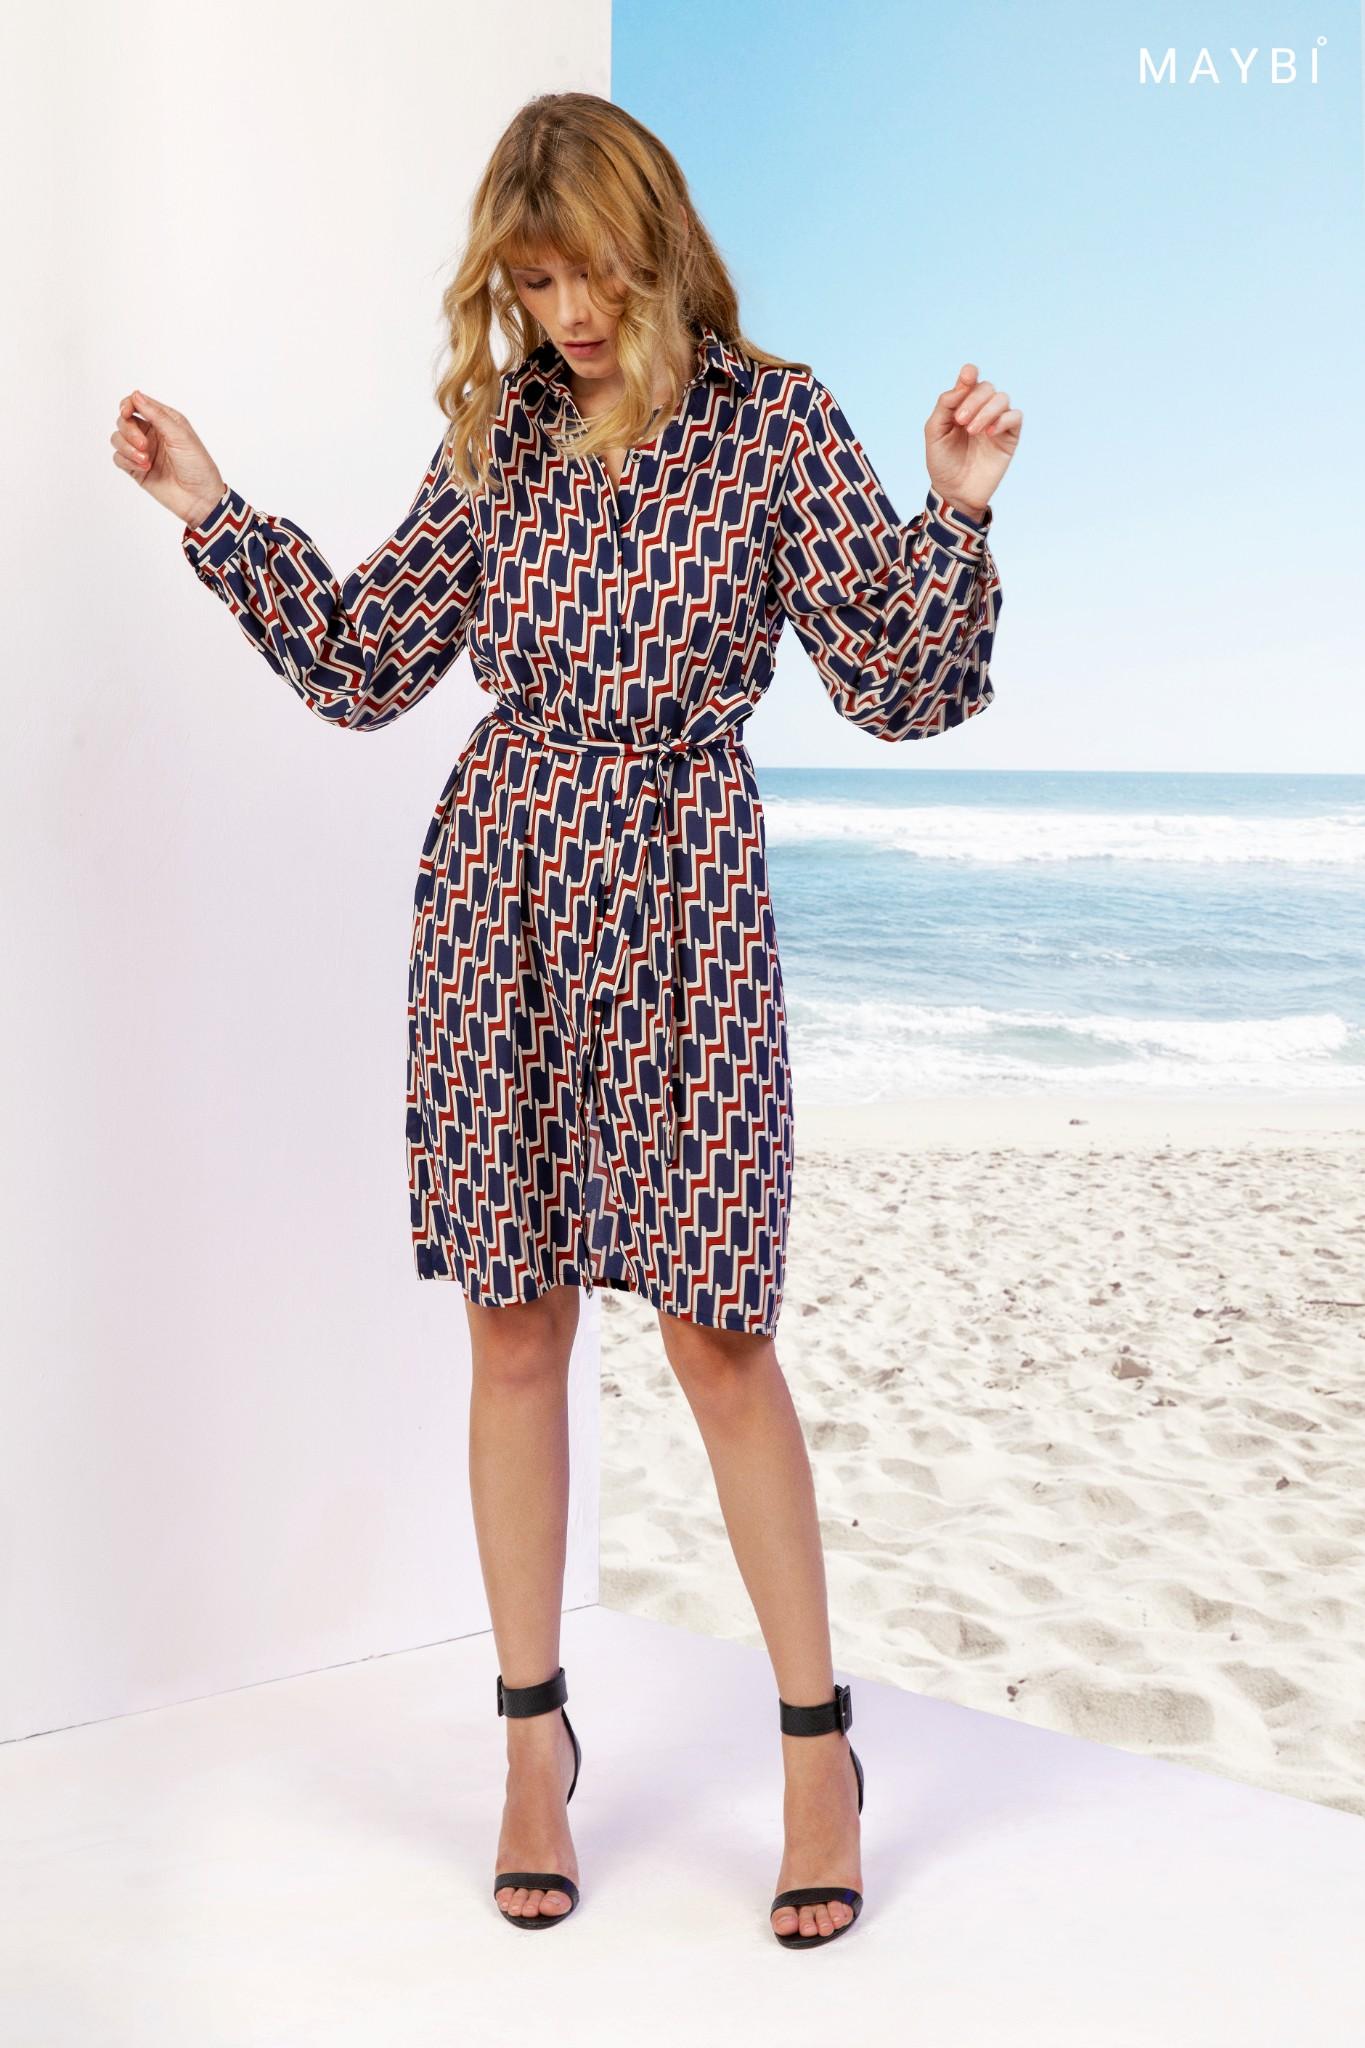 Đầm sơ mi họa tiết - Chrissy Taffy Shirt Dress